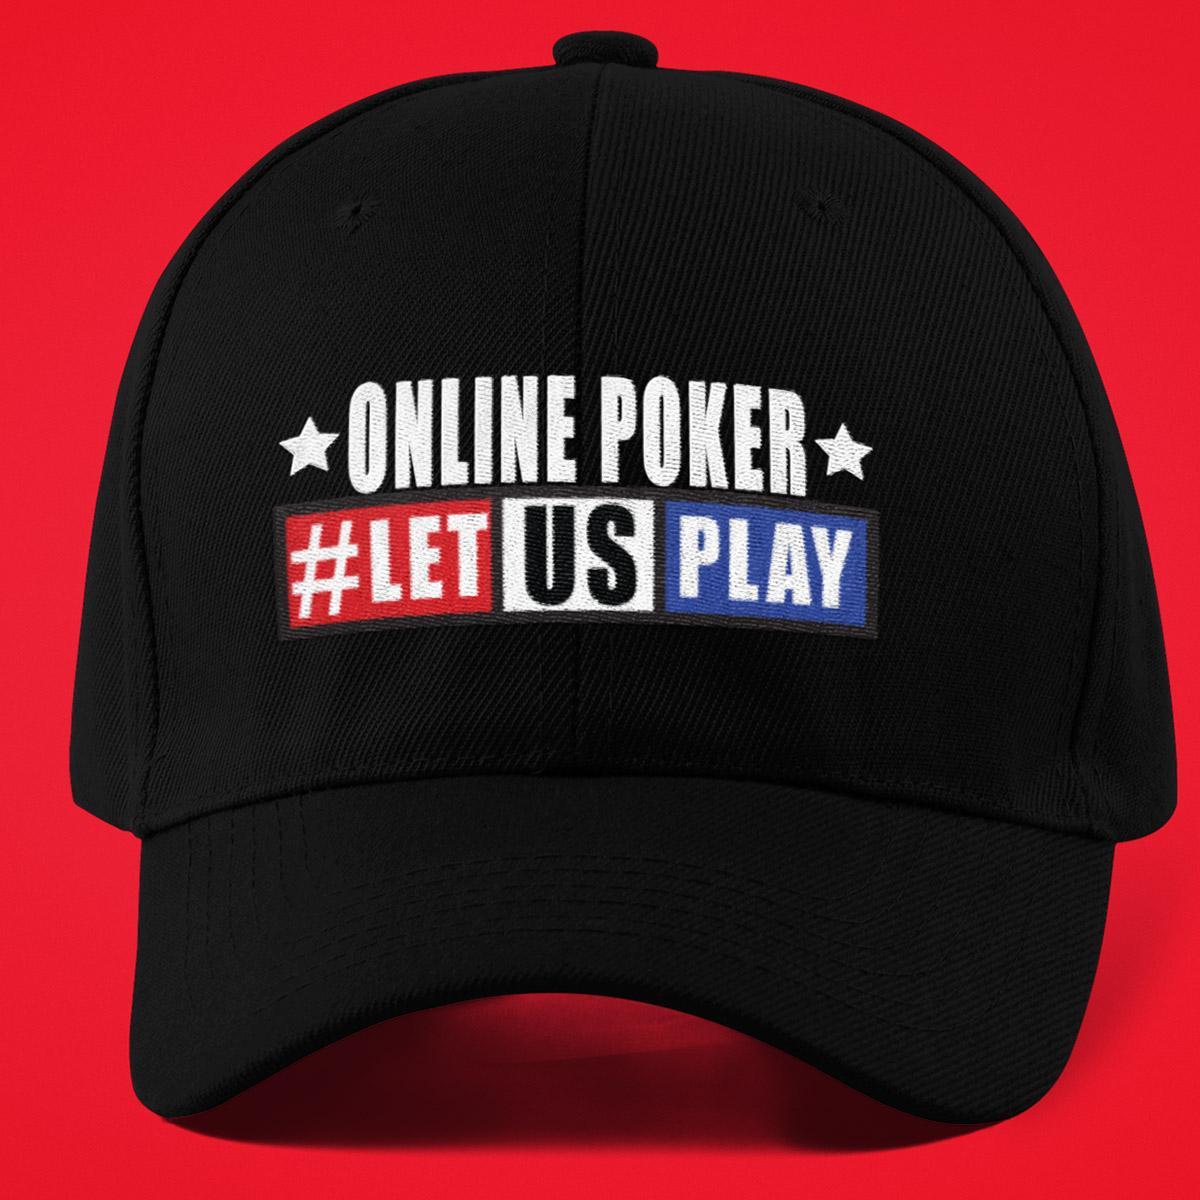 Online Poker Let US Play Poker Hat